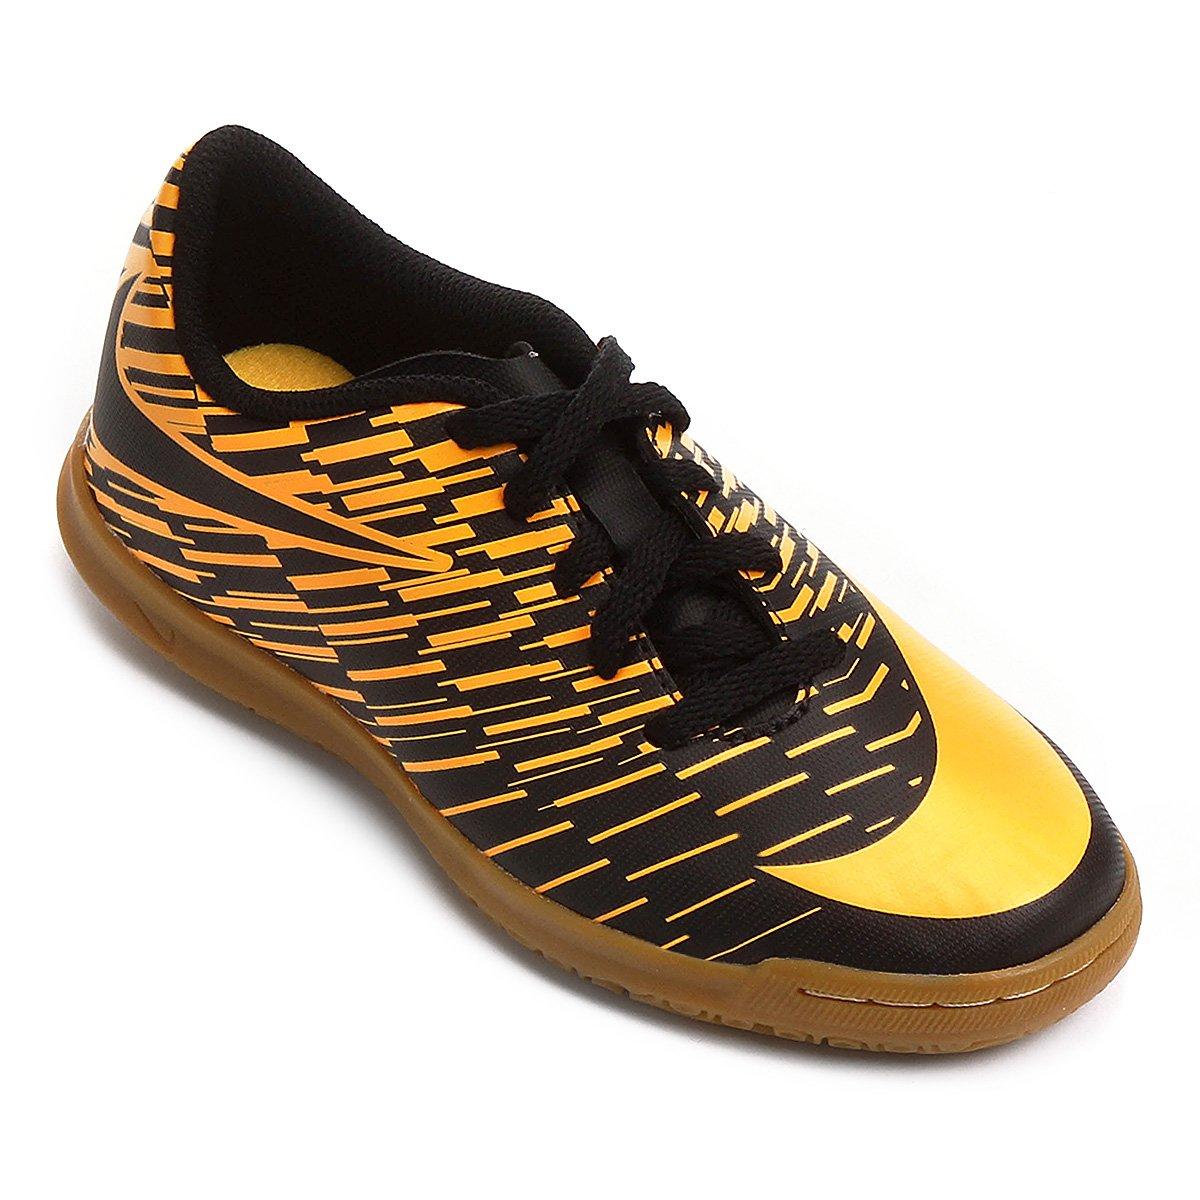 8689009d0d1 Chuteira Futsal Infantil Nike Bravata 2 IC - Compre Agora